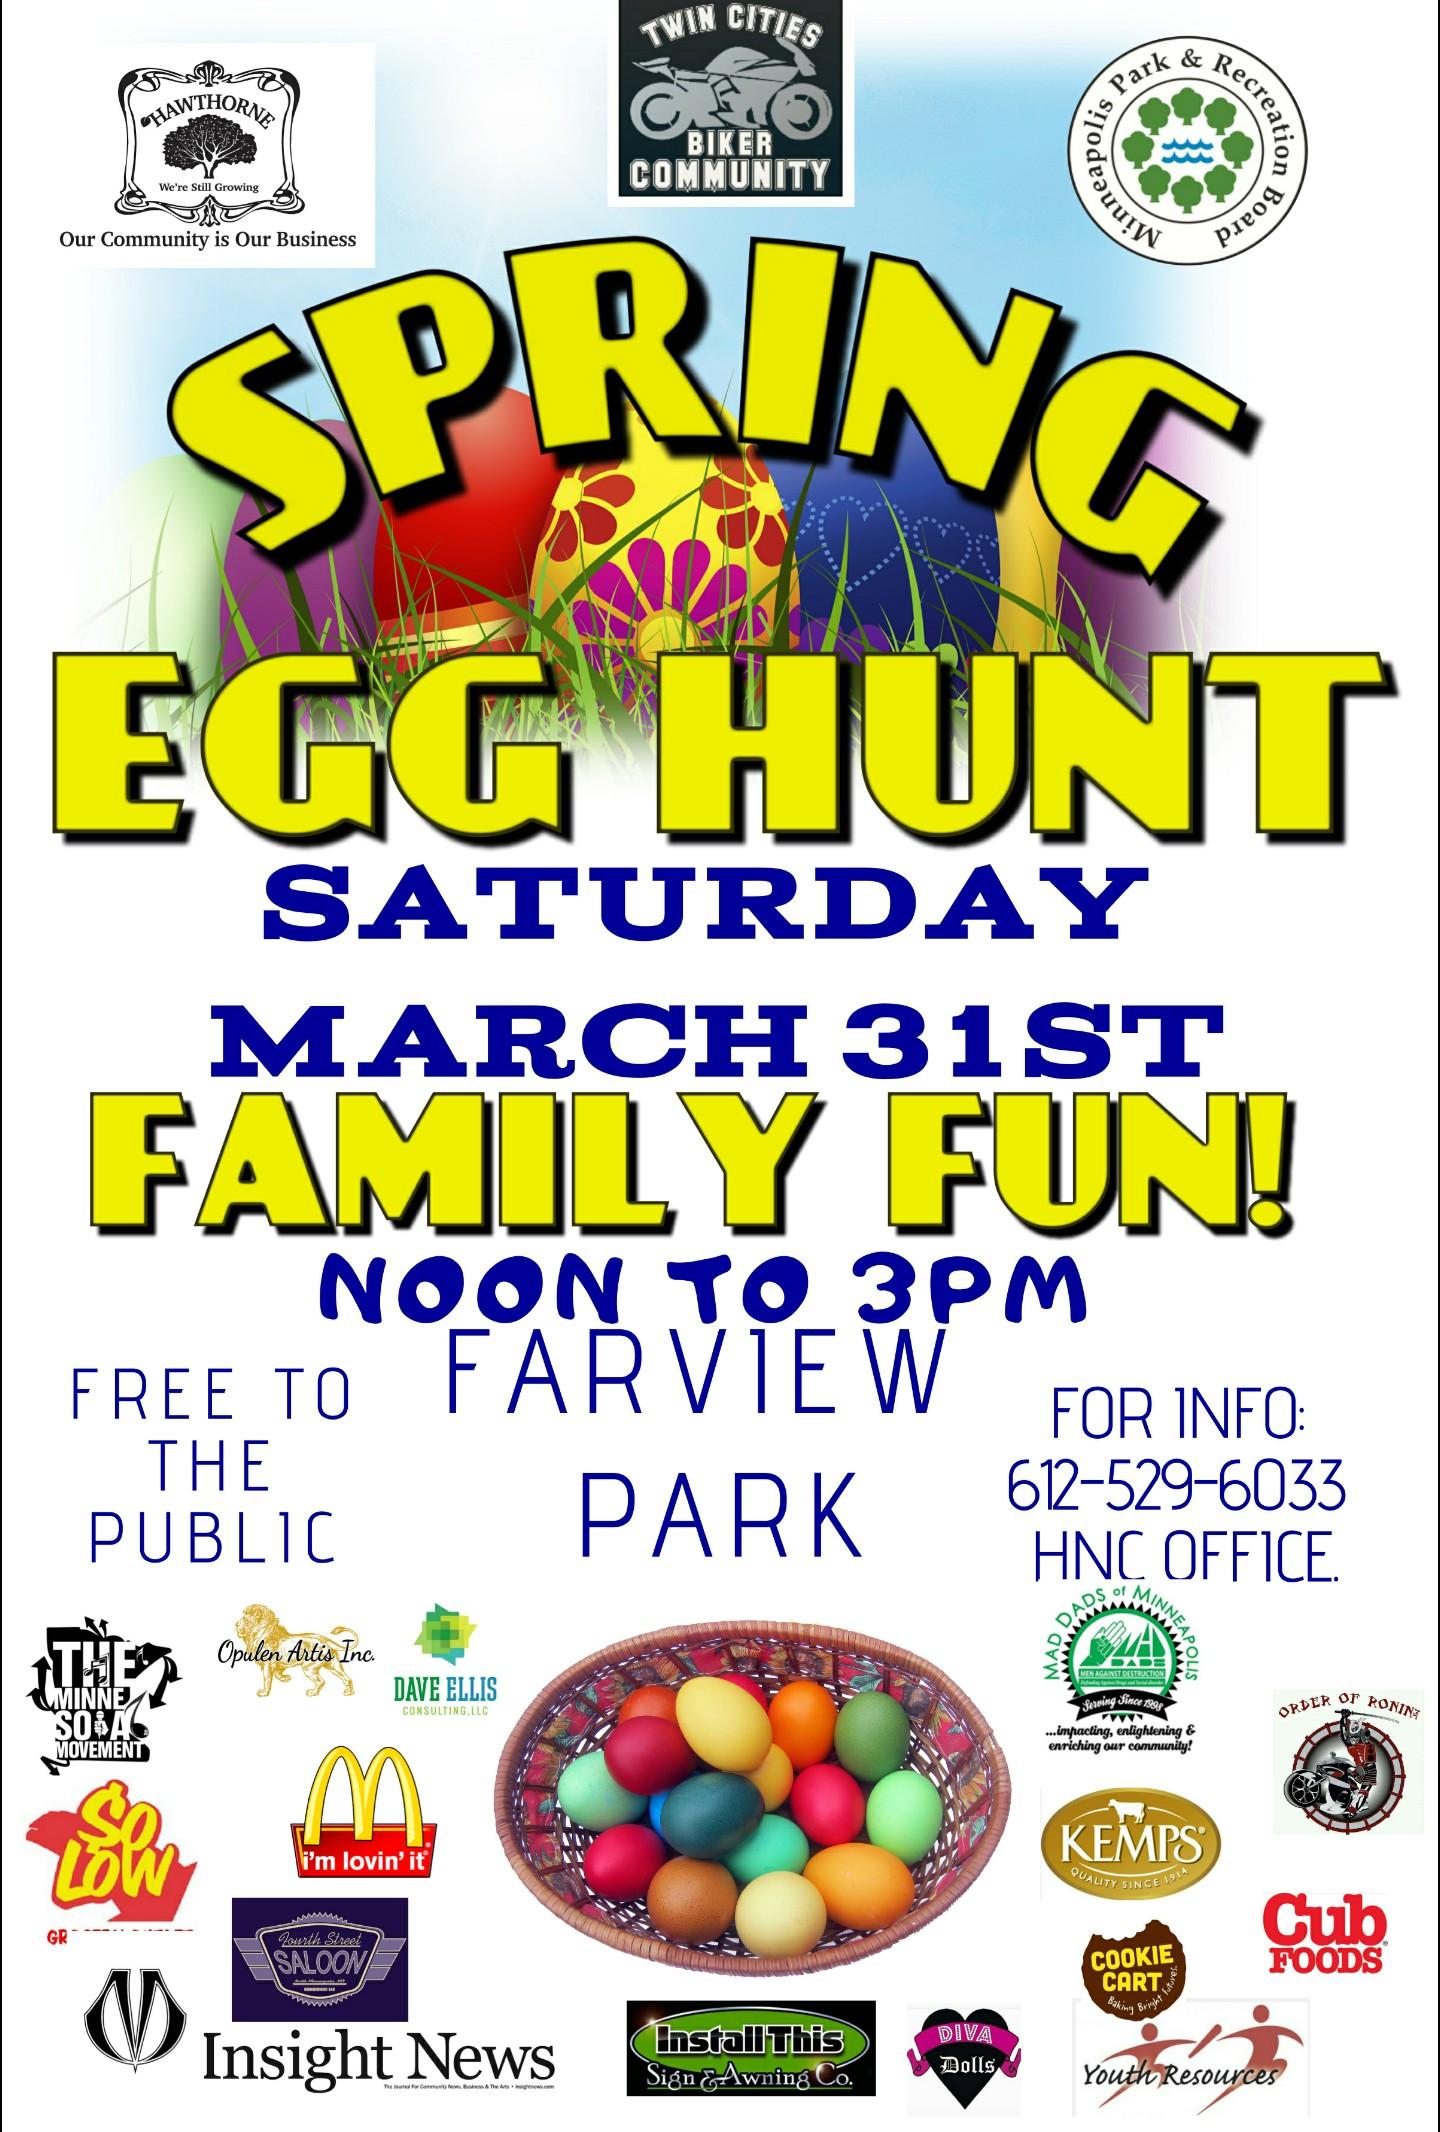 Spring Egg Hunt Family Fun! @ Farview Park   Minneapolis   Minnesota   United States